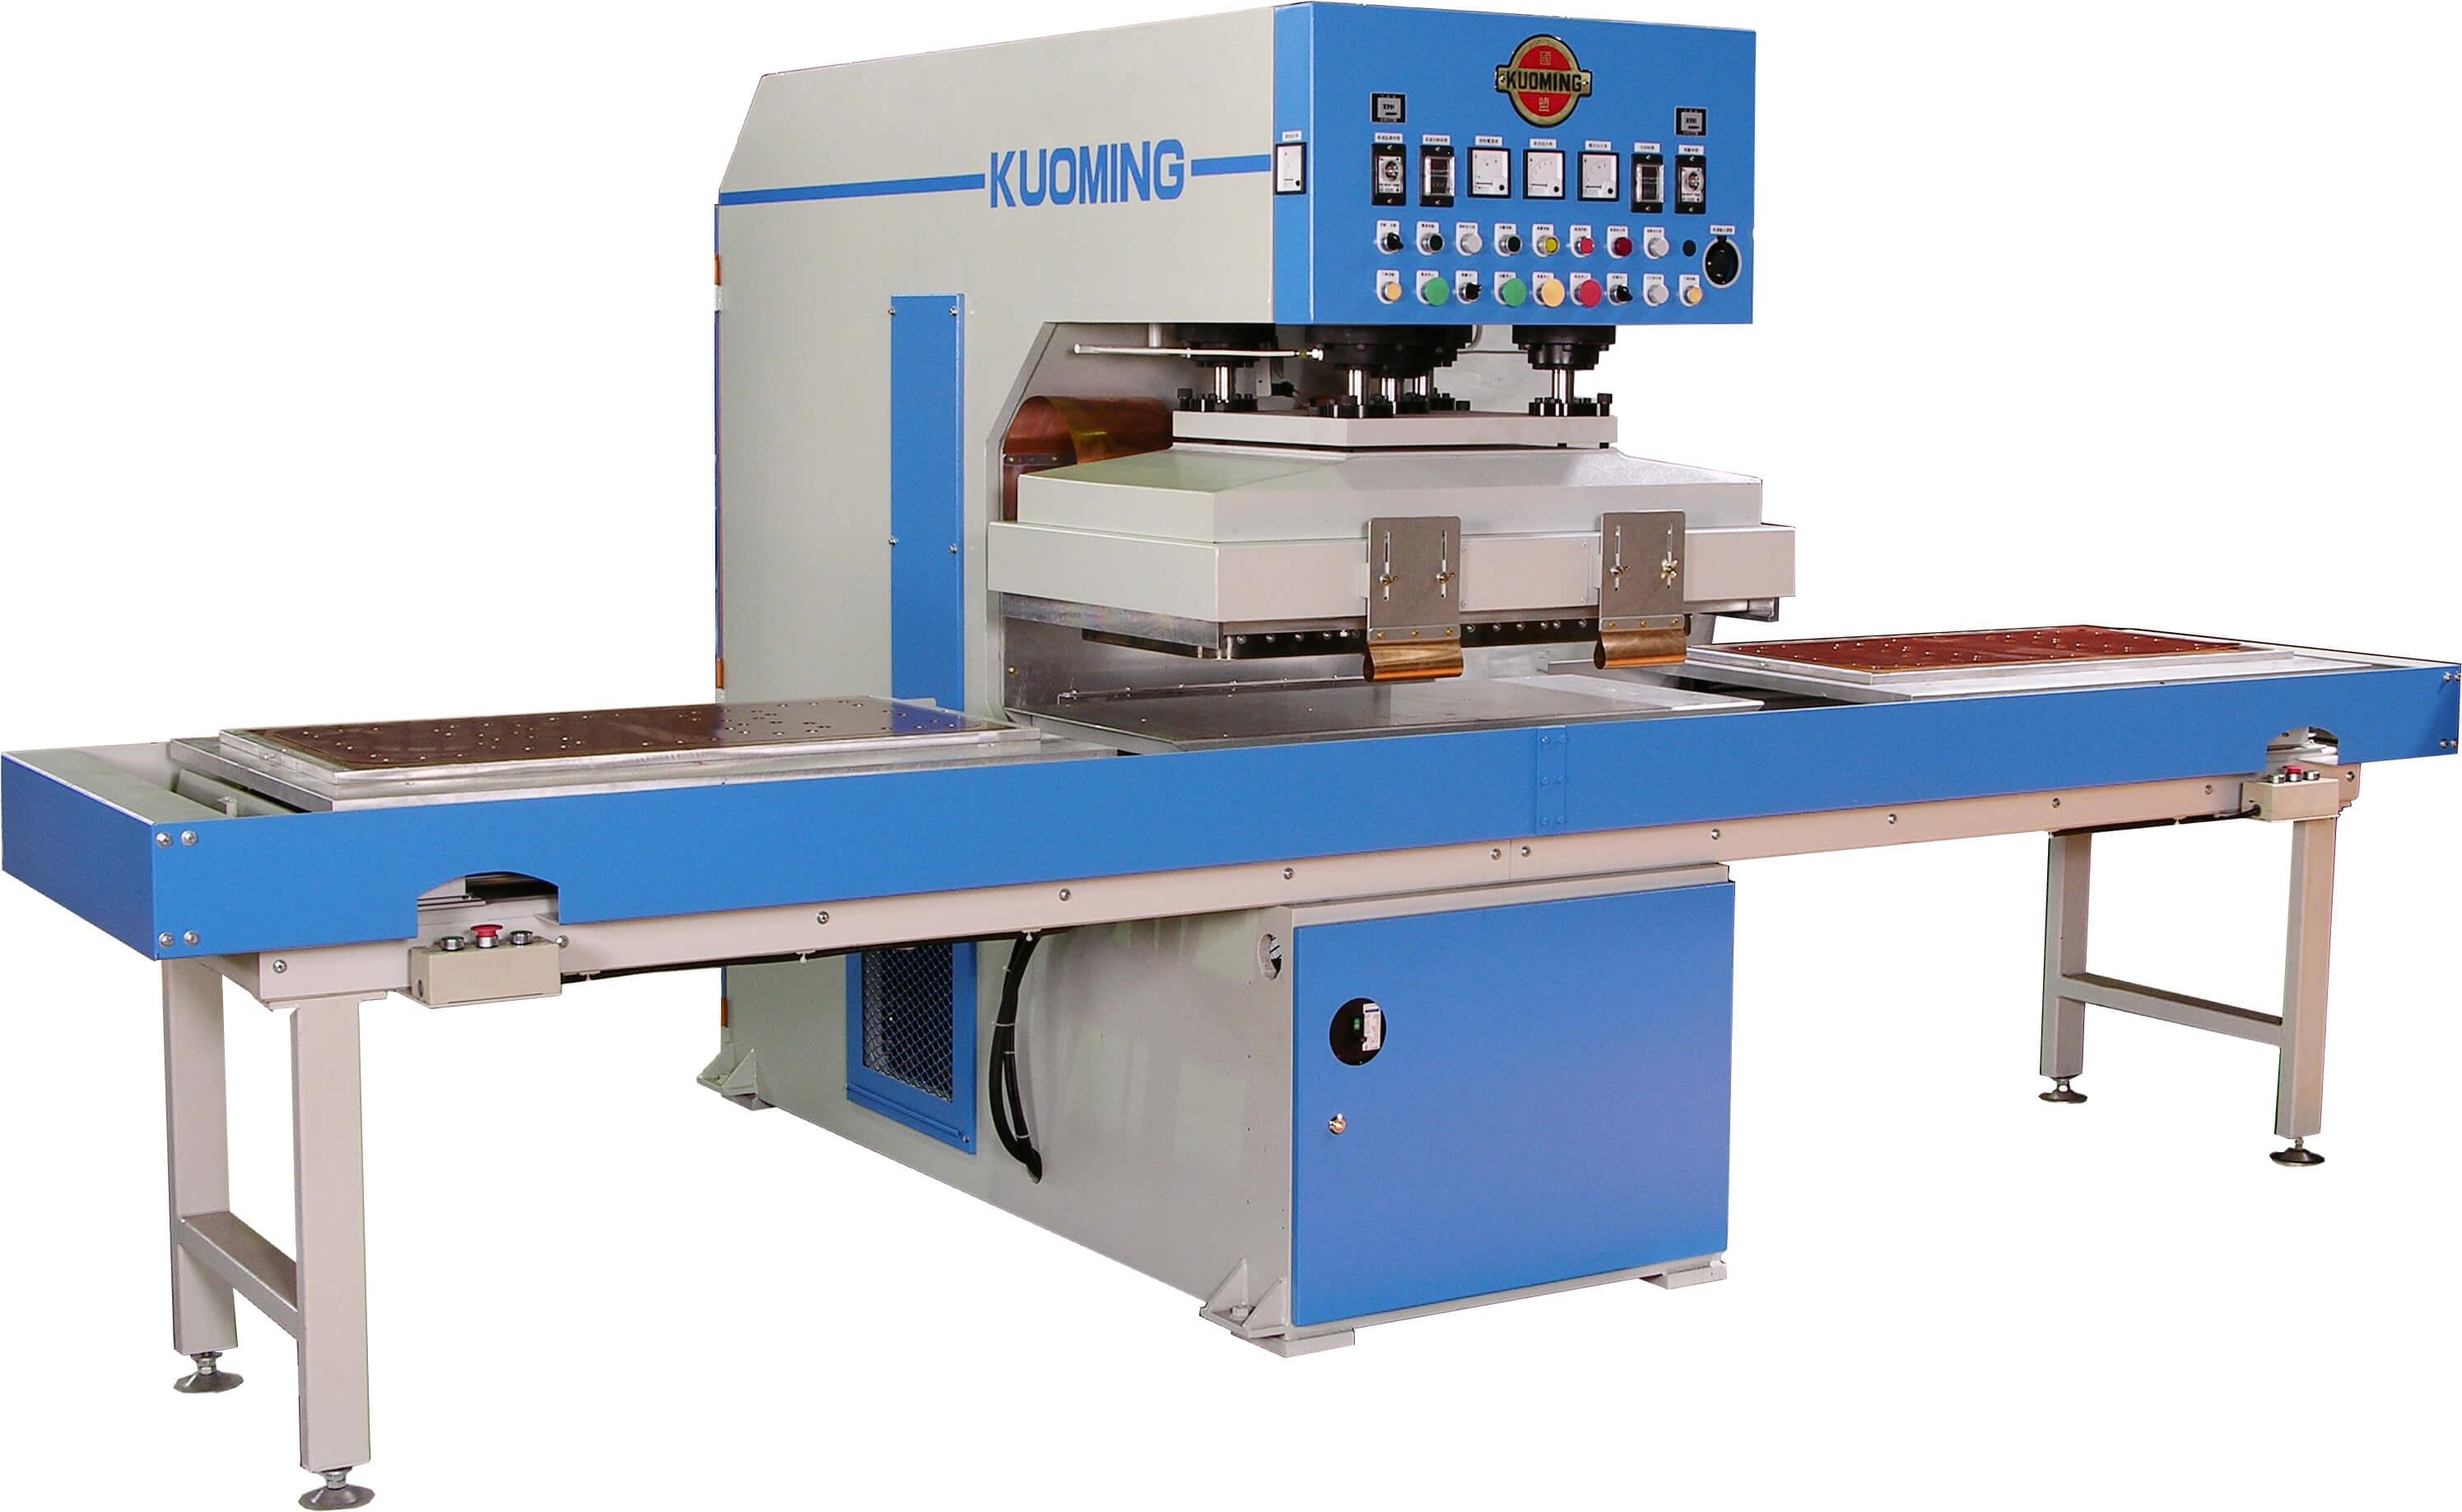 High Frequency Plastic Welding Amp Cutting Machine Plastic